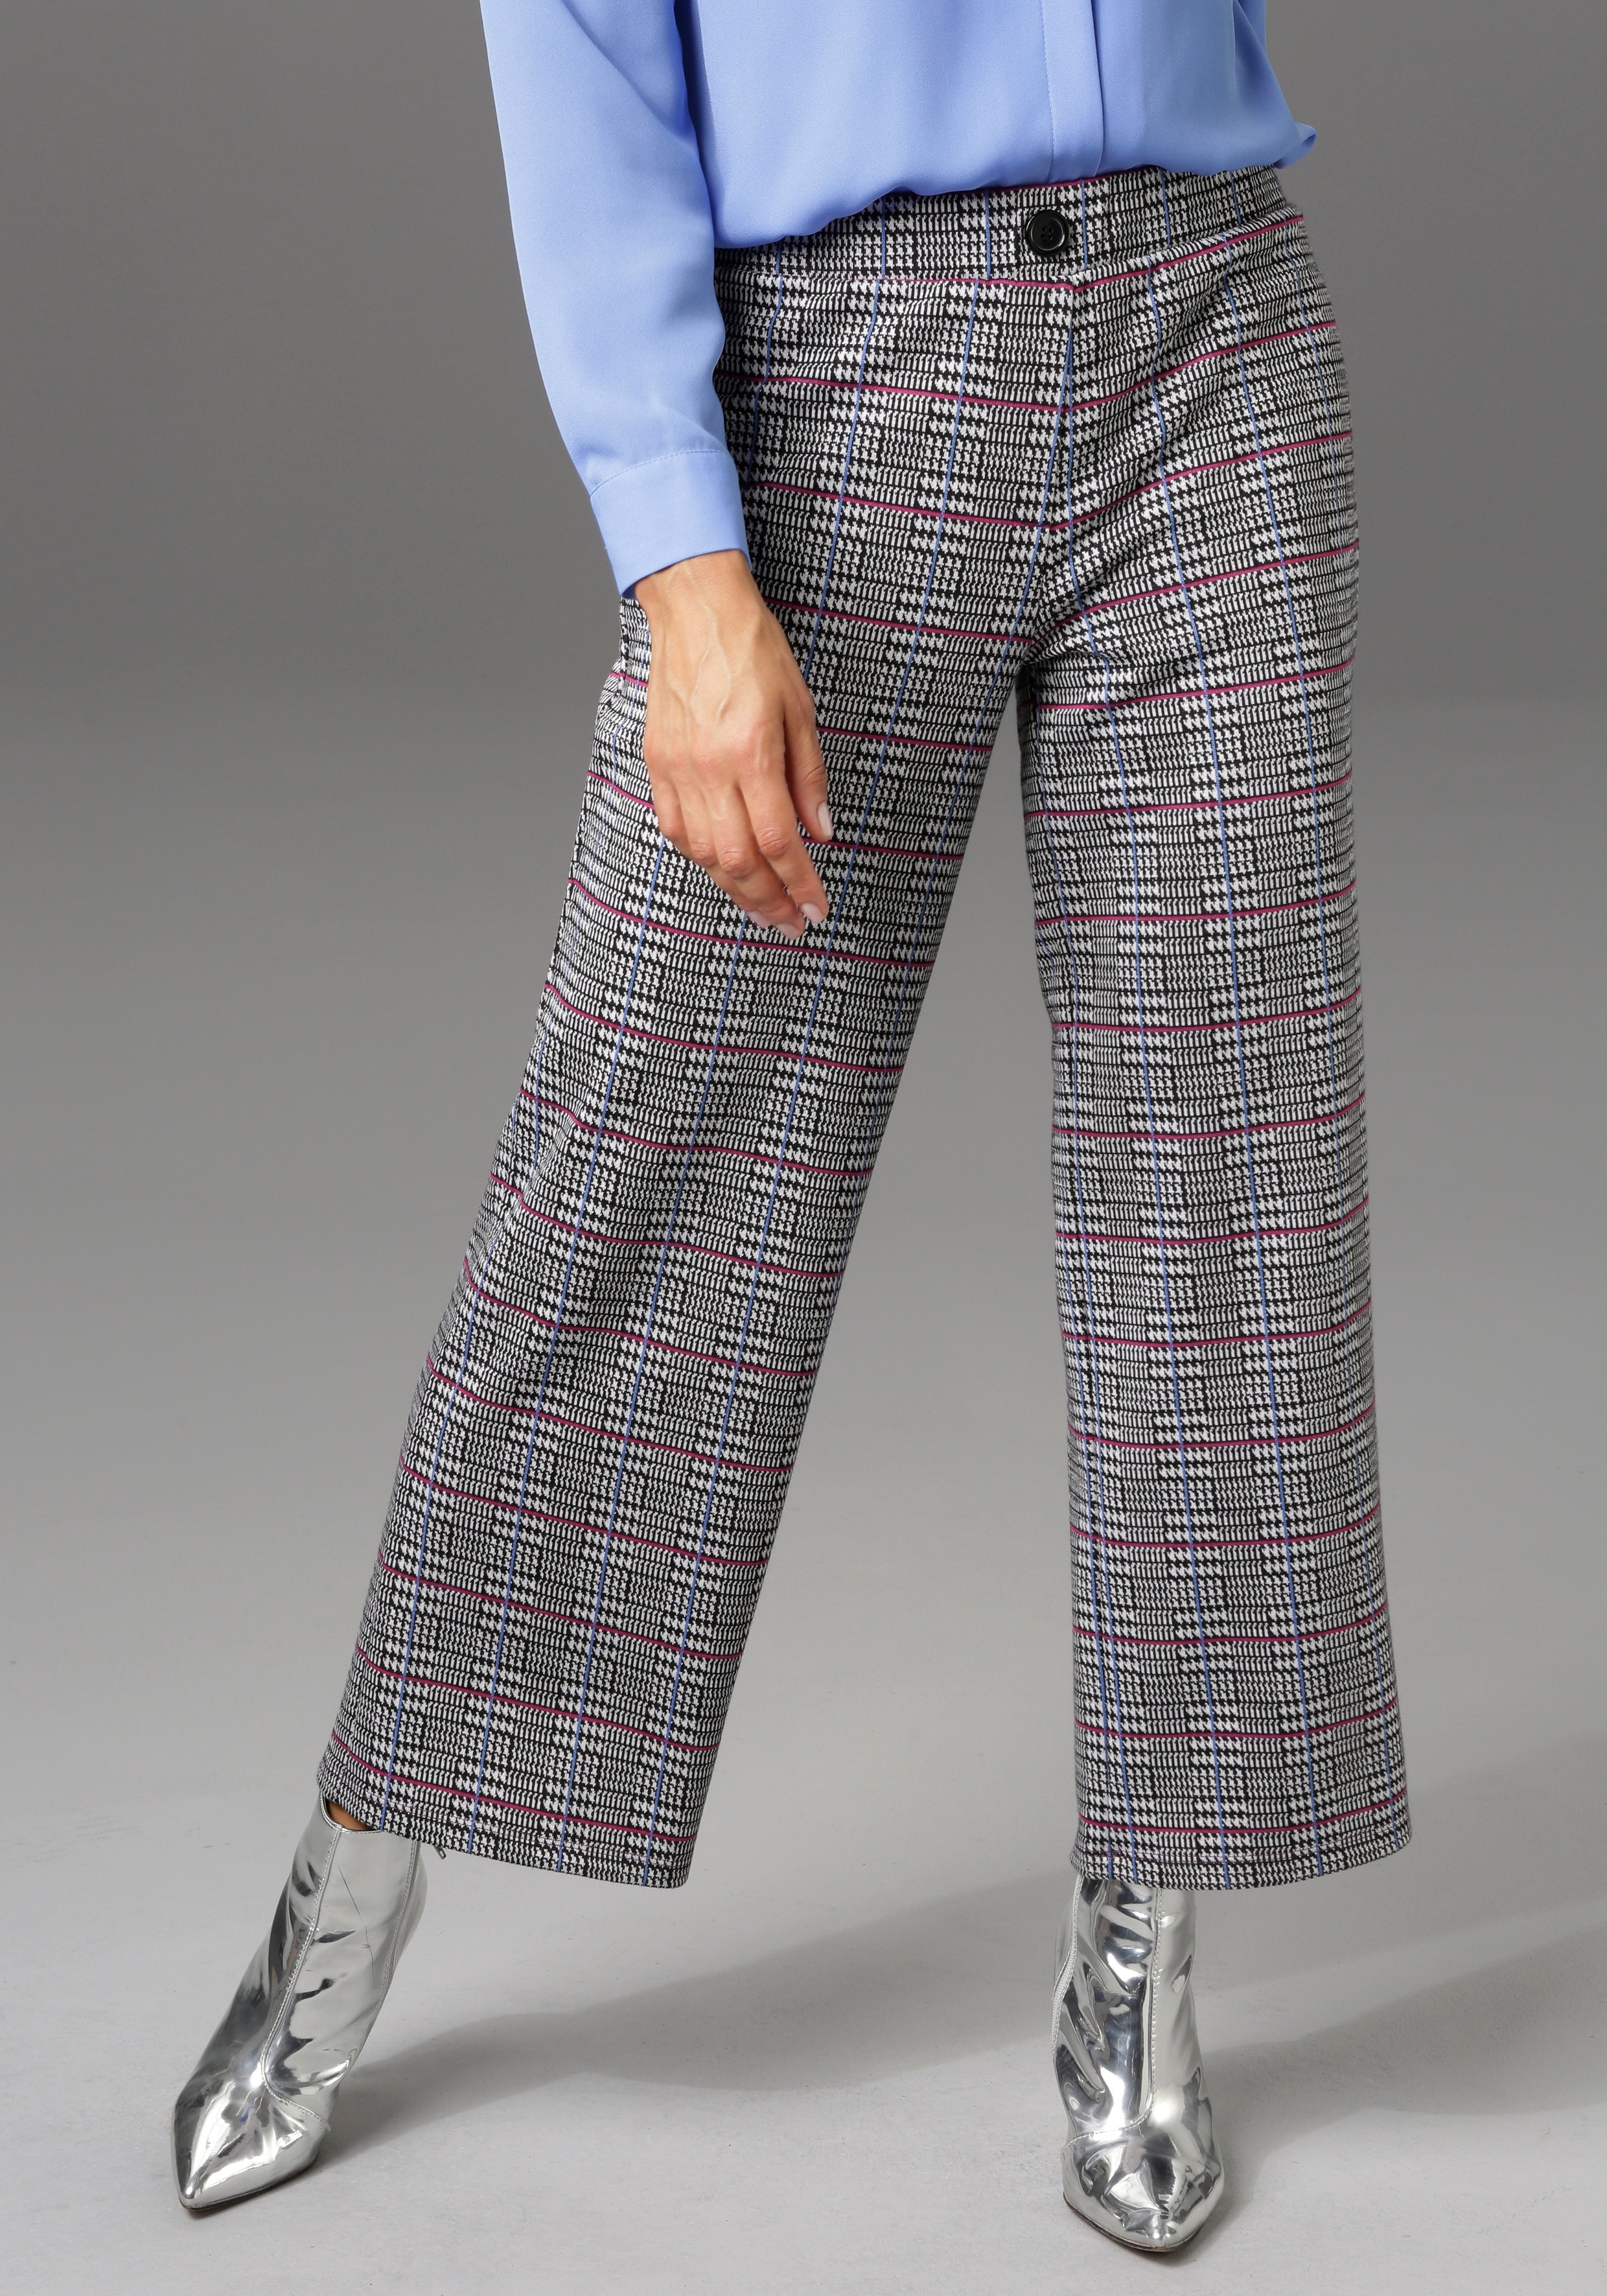 aniston casual -  Culotte, im trendigen Karo-Dessin - NEUE KOLLEKTION